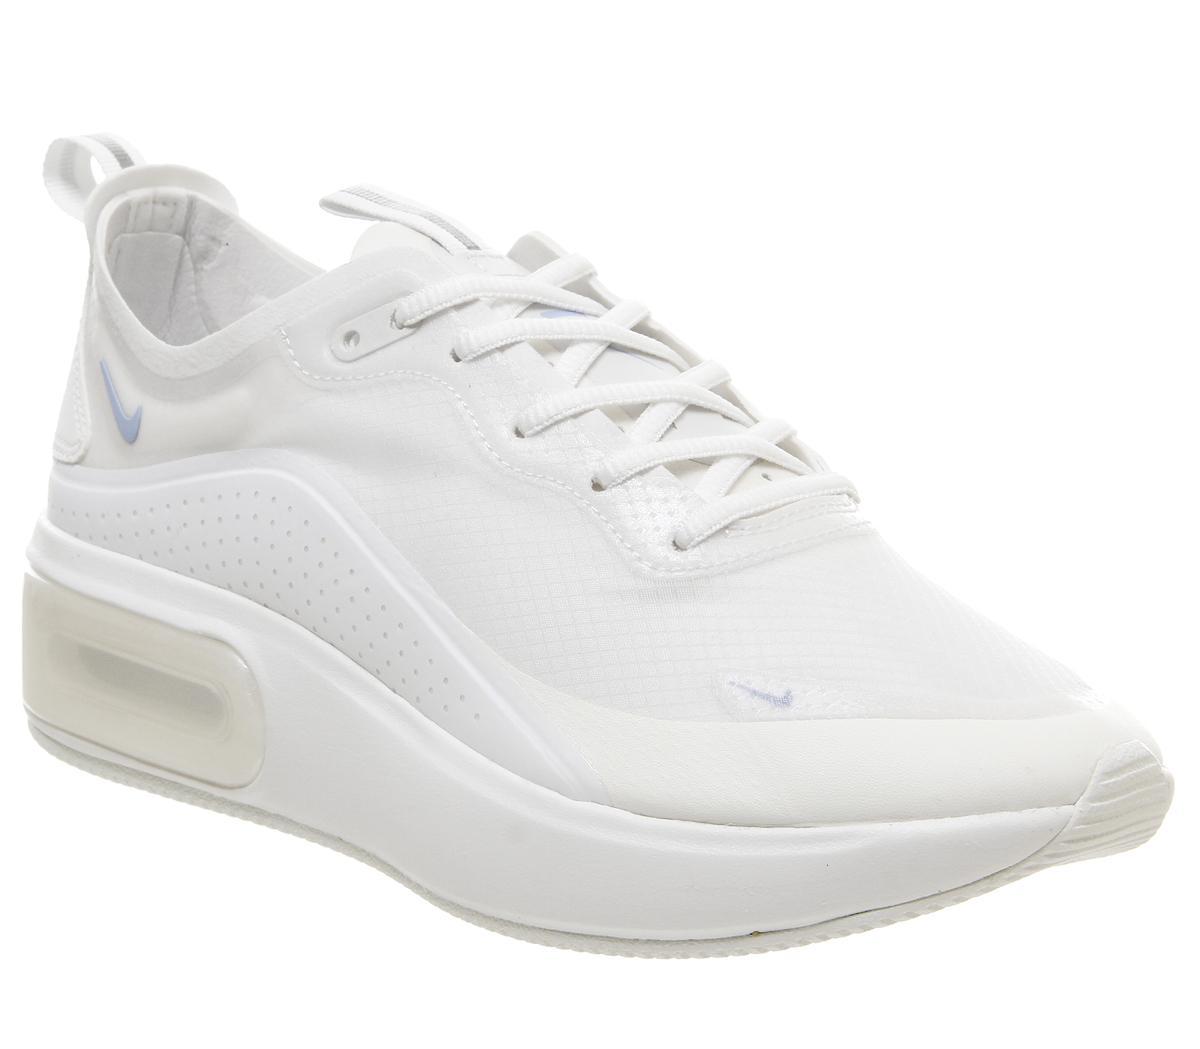 Nike Air Max Dia Trainers Summit White